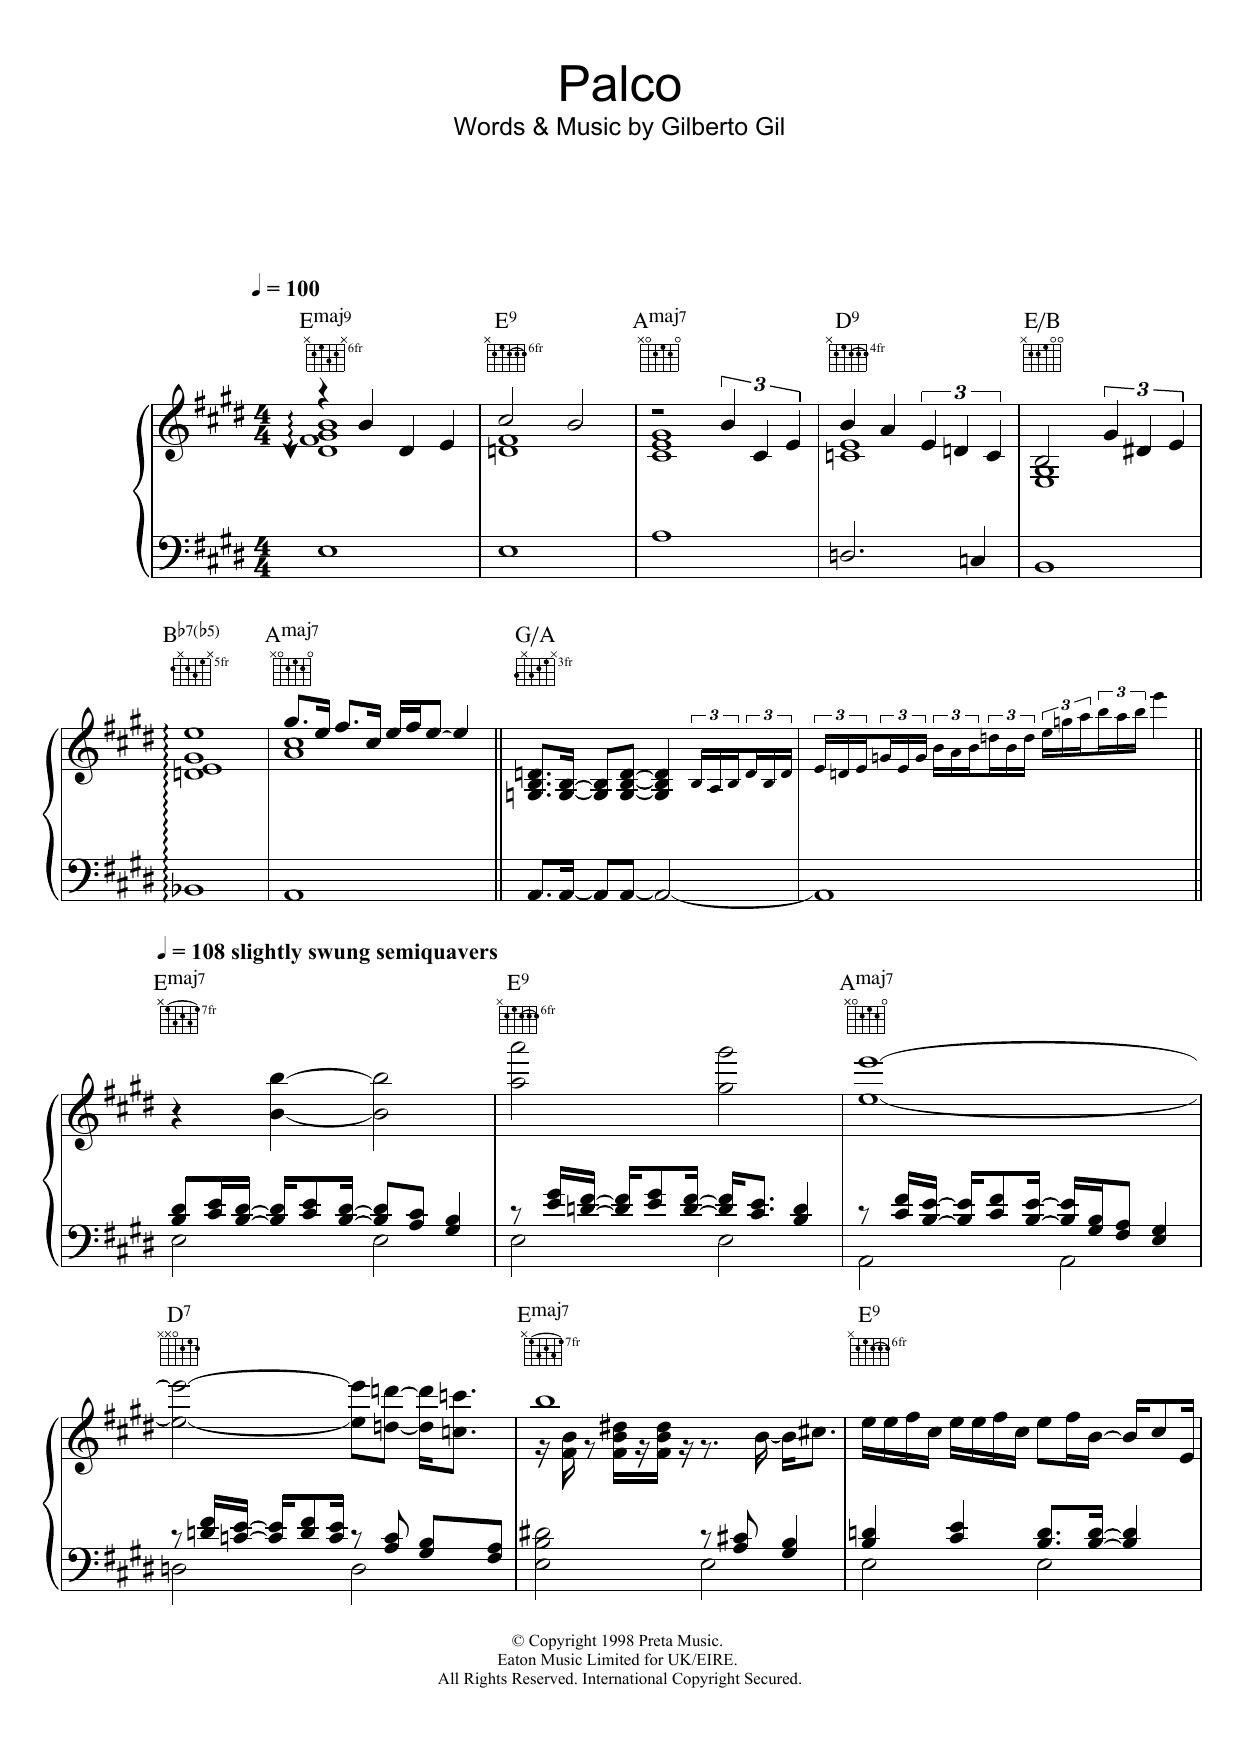 Palco Sheet Music